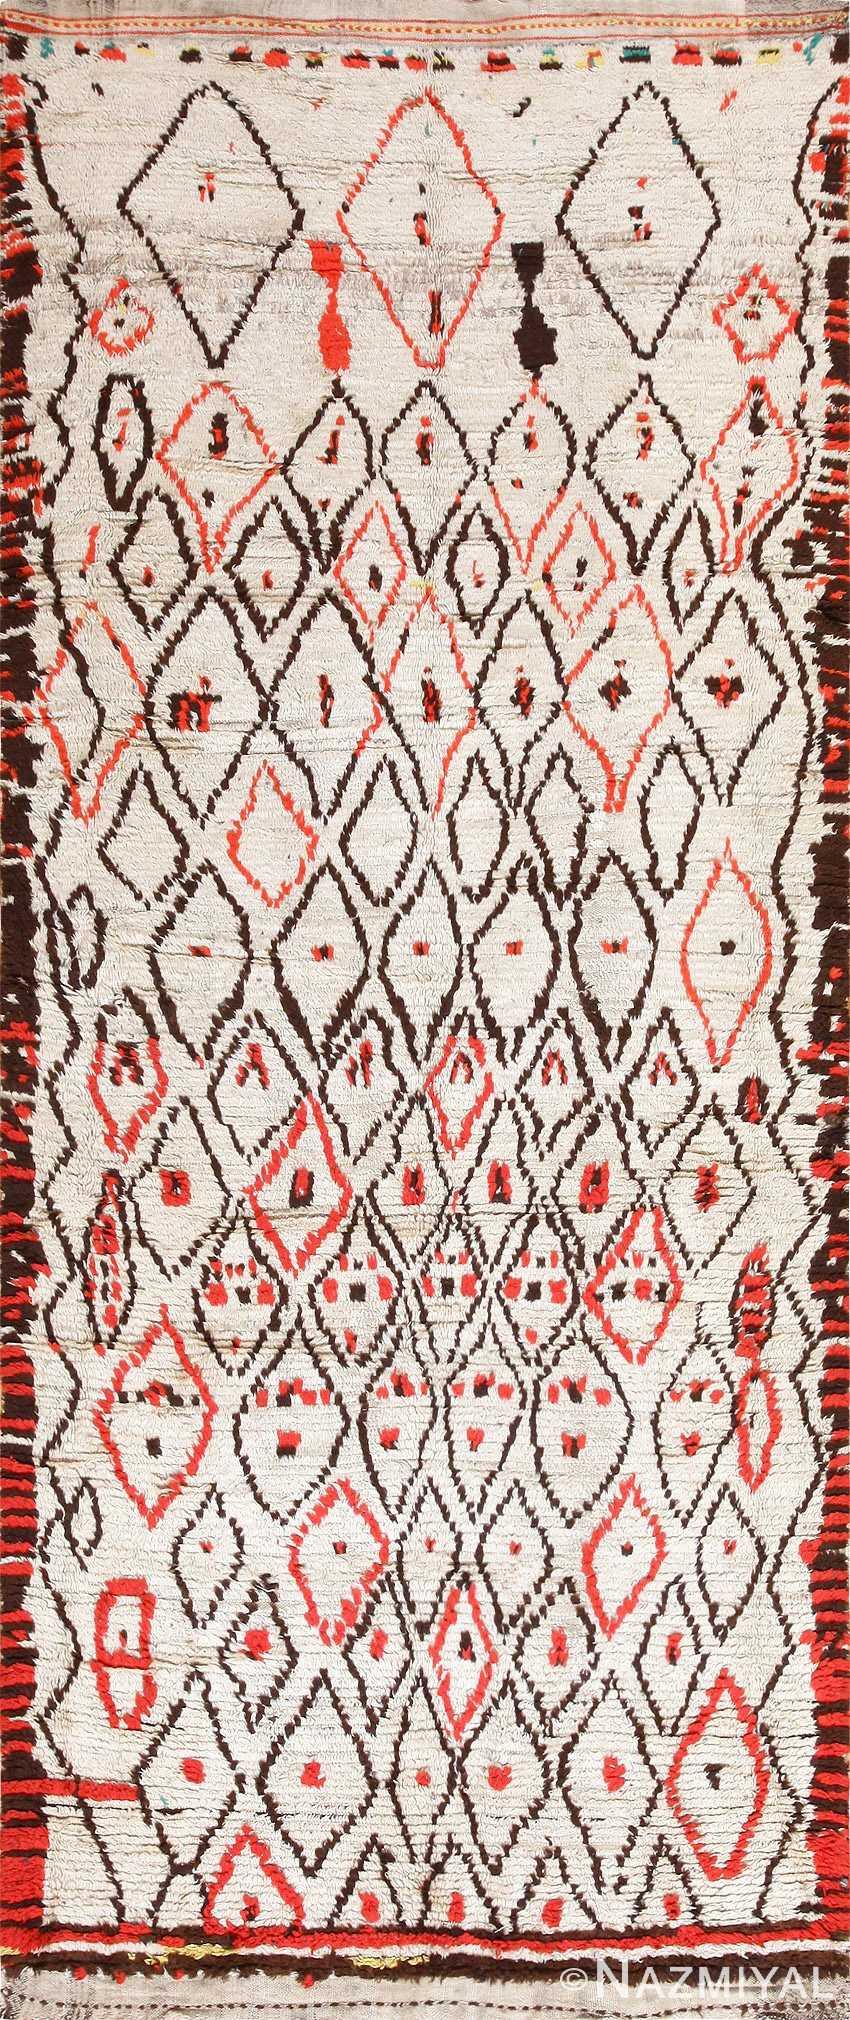 Rare White and Red Vintage Moroccan Carpet 47954 Nazmiyal